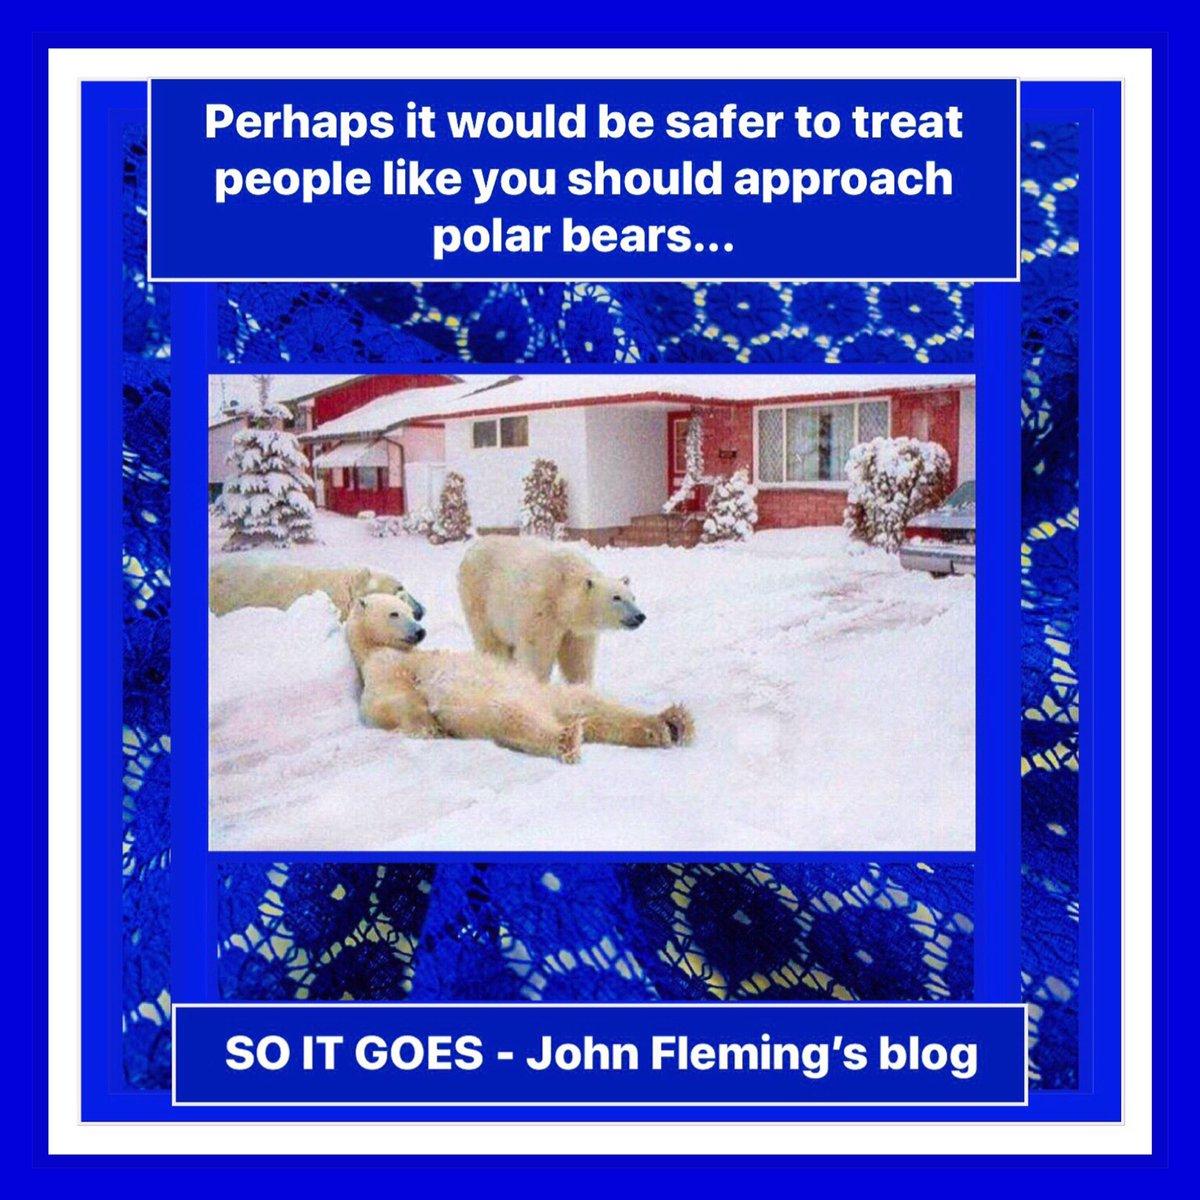 """Perhaps it would be safer to treat people like you should approach polar bears…""   #thejohnfleming #blog  #kenya #africa #eastafrica #nairobi #mombasa #django #kolkata #mumbai #pune #juba #tamil #johannesburg #bloemfontein #soweto #pietermaritzburg #nyc"